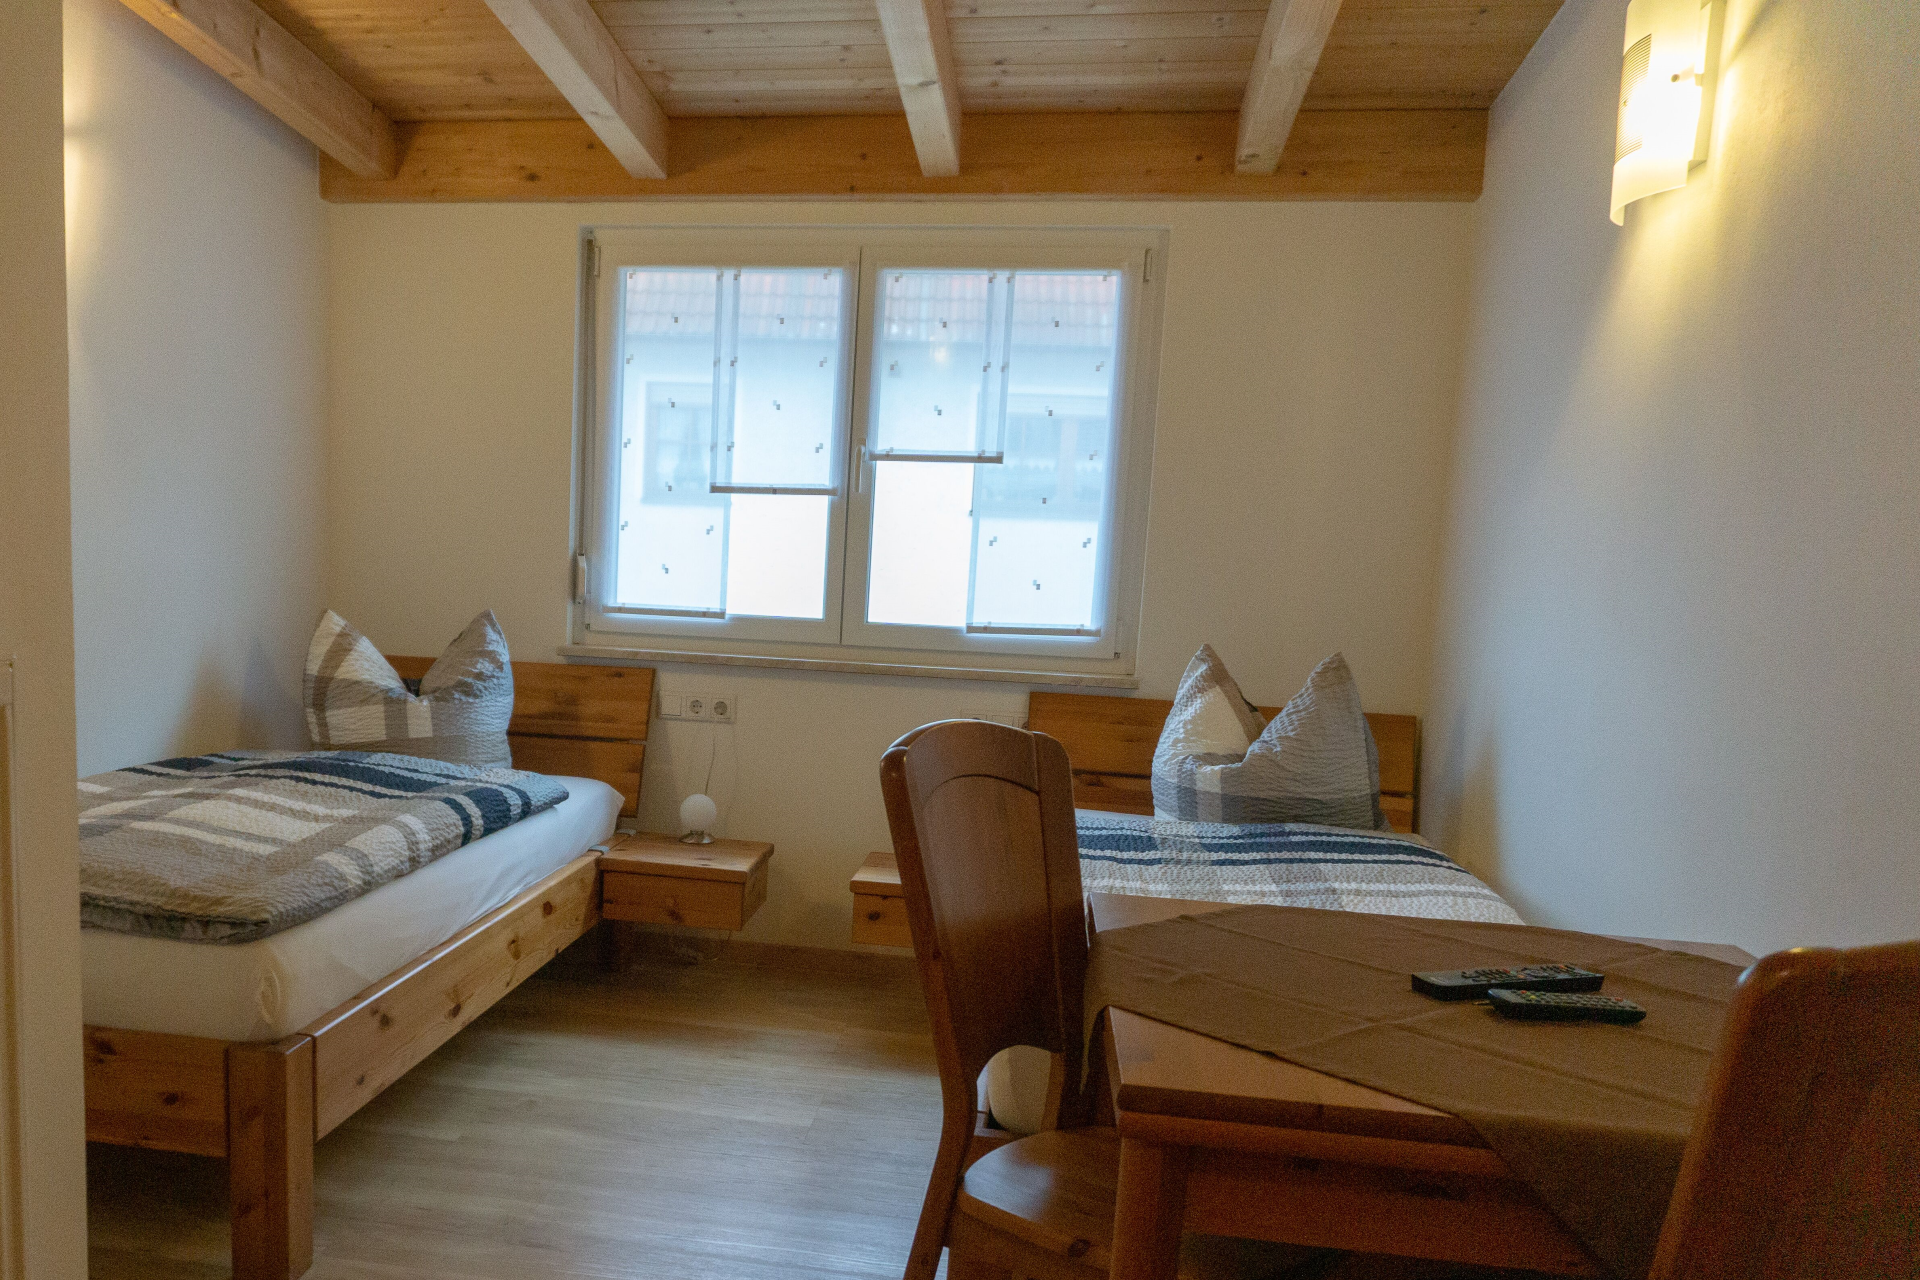 Doppelzimmer-John-Veitsbronn-bei-Fuerth